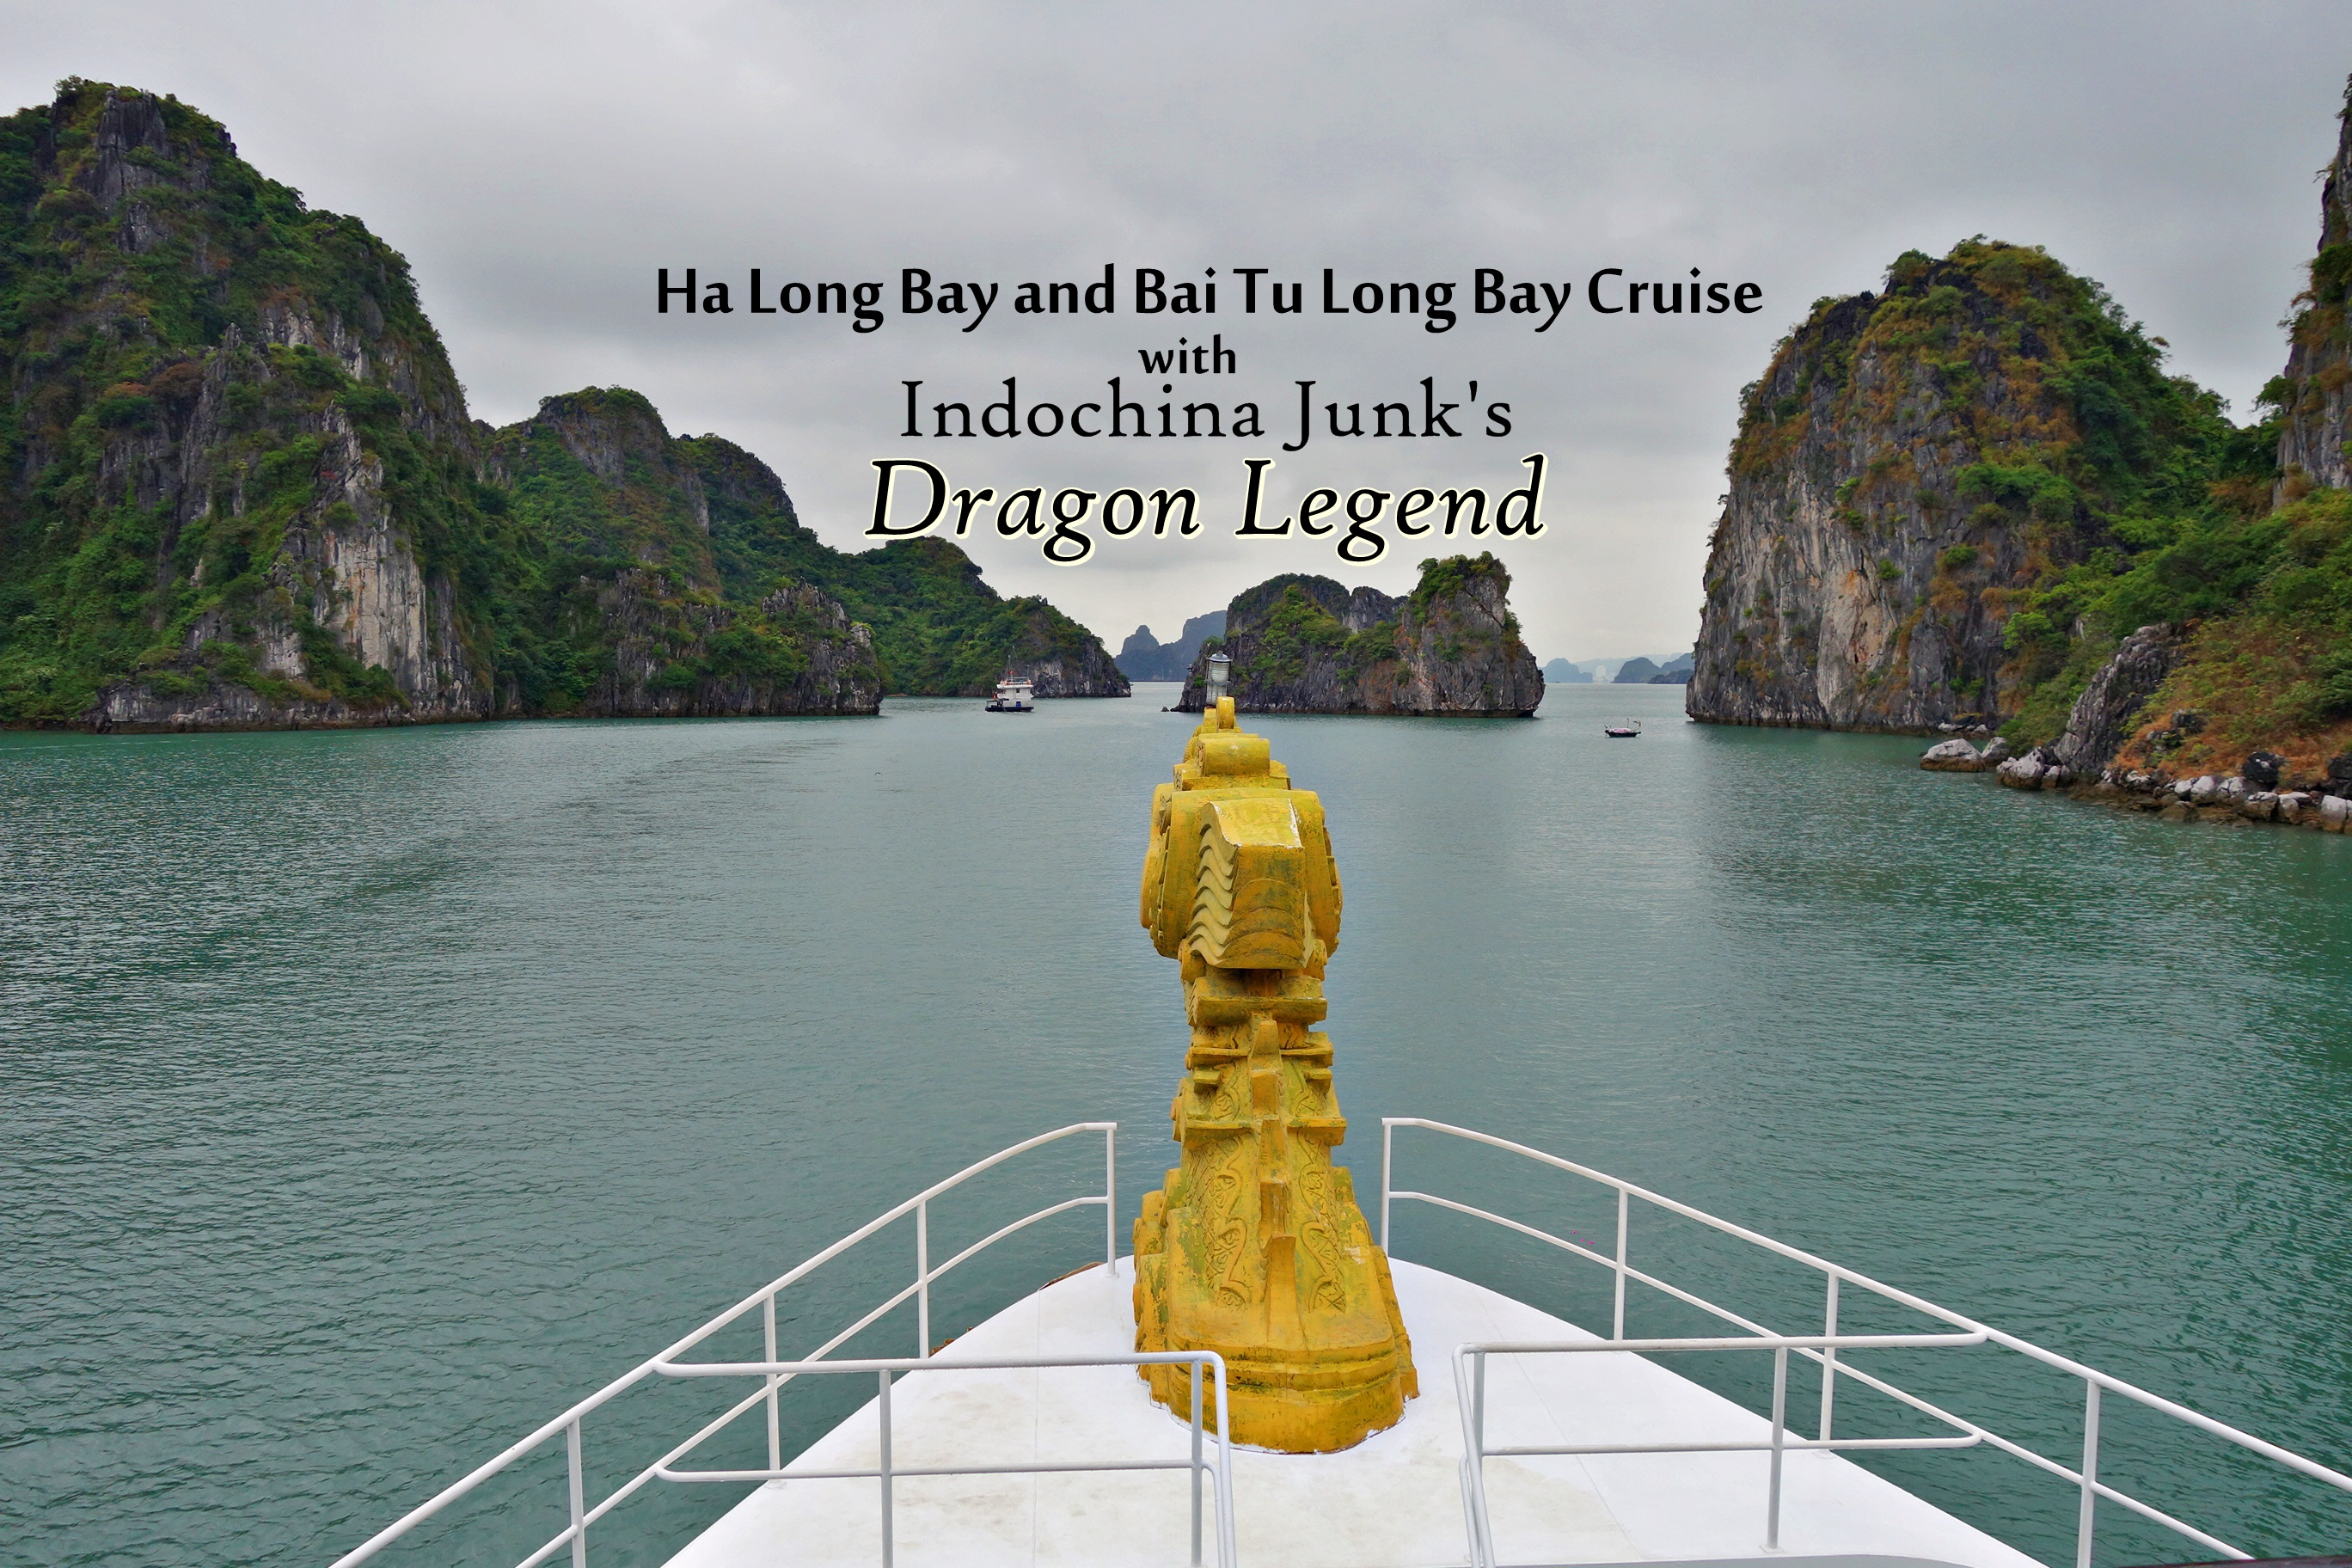 Bai Tu Long Bay Cruise with Indochina Junk's Dragon Legend